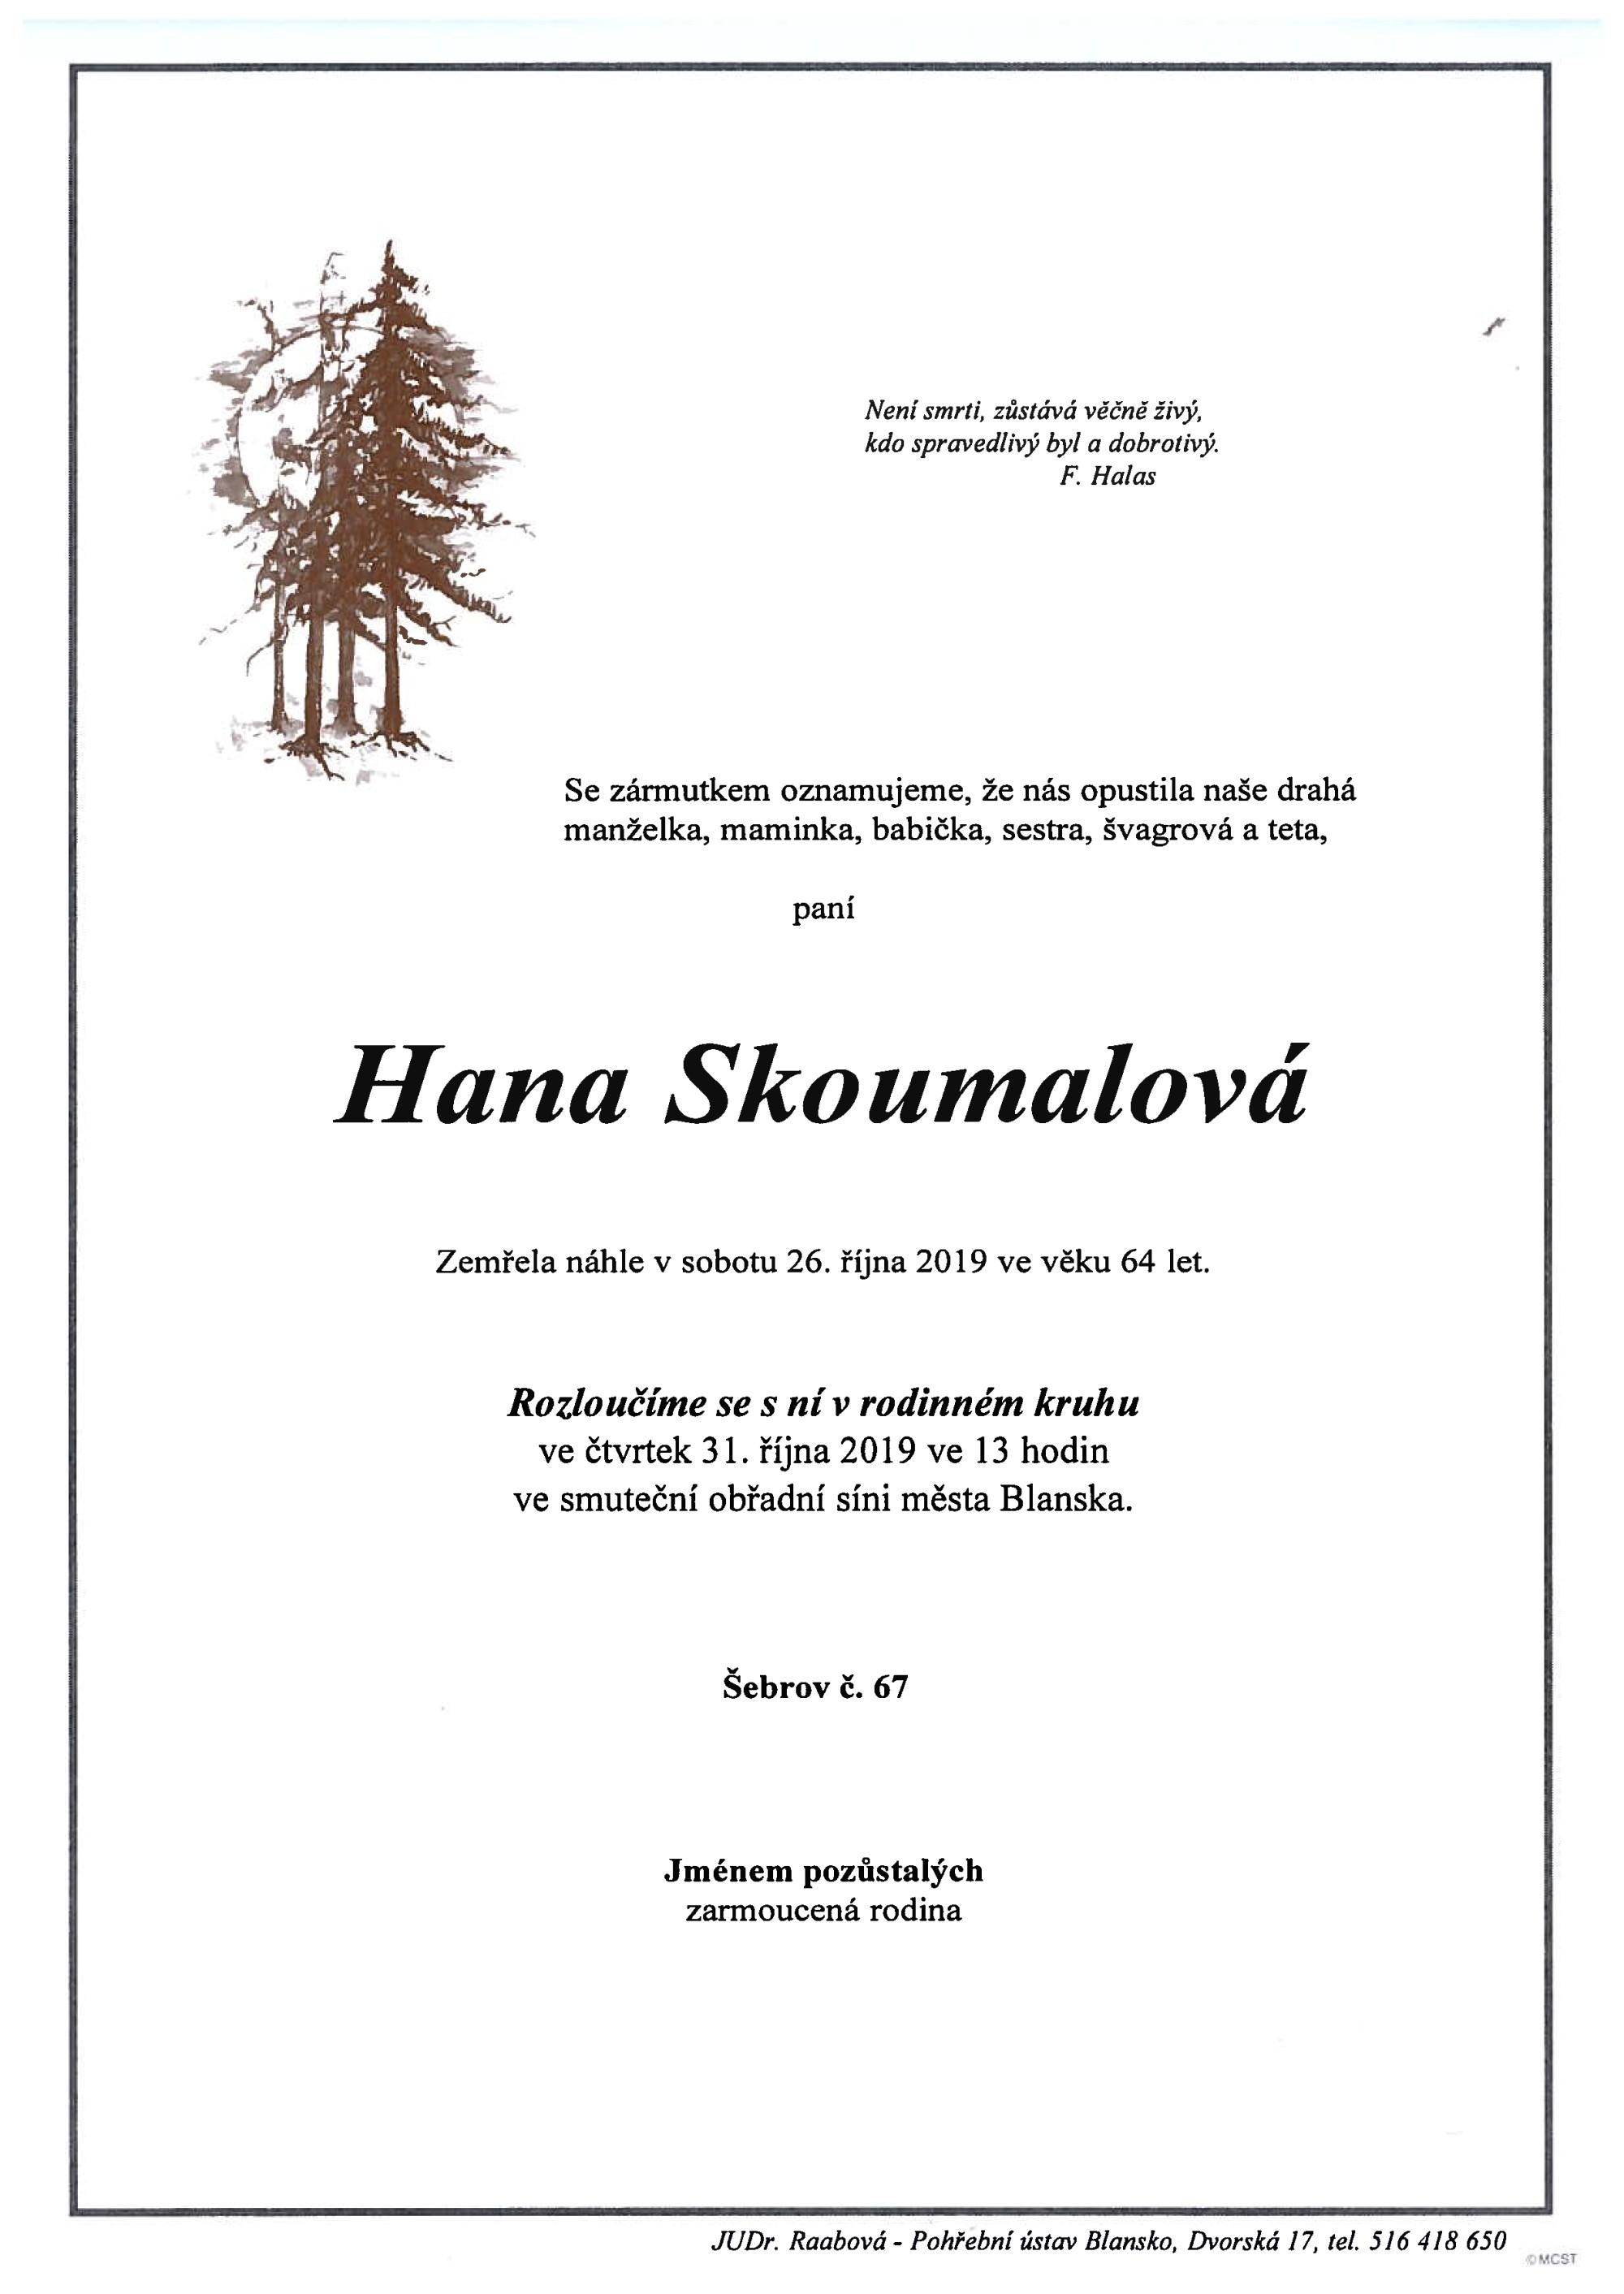 Hana Skoumalová